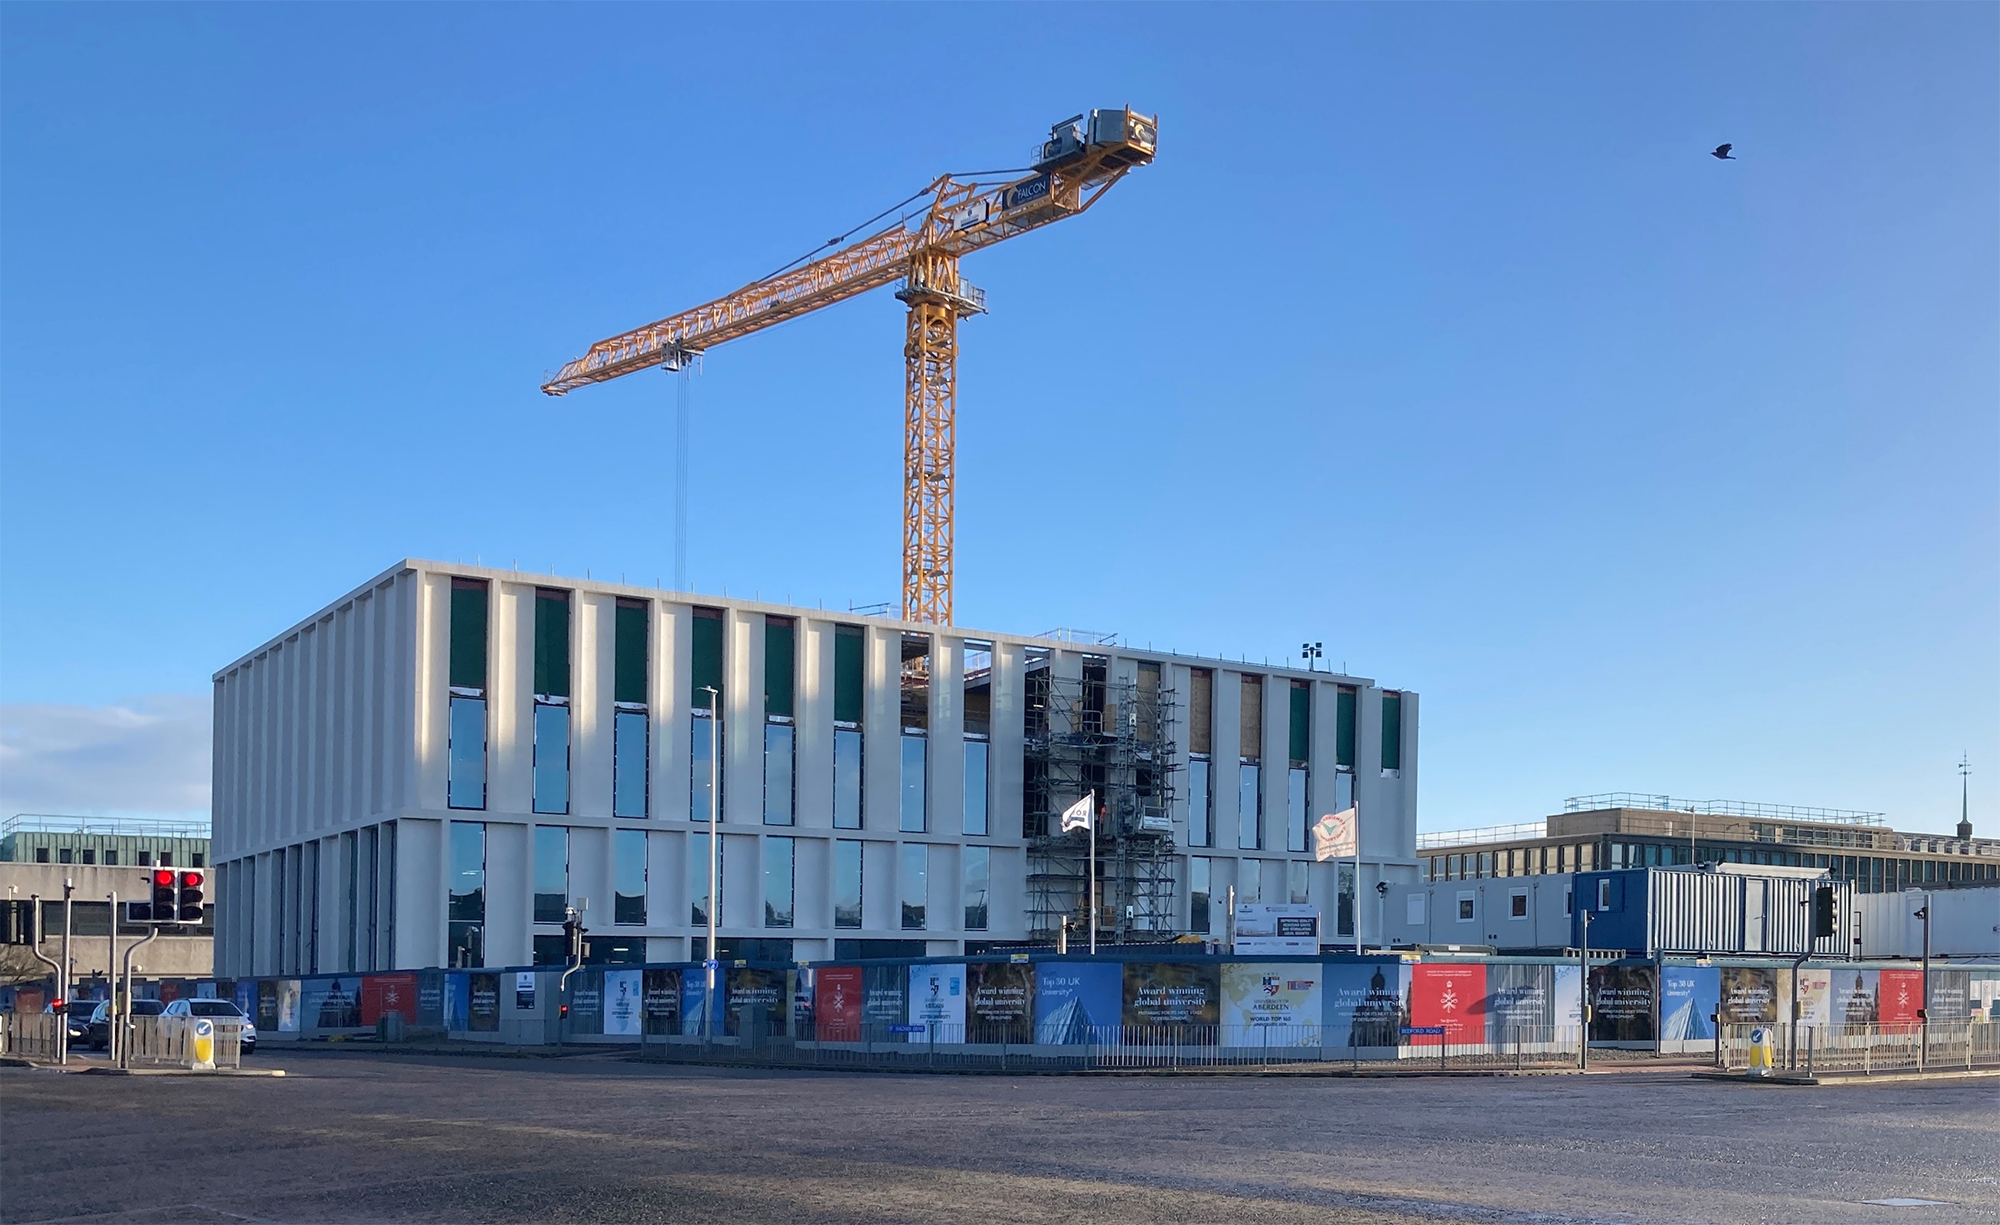 Science Teaching Hub Aberdeen